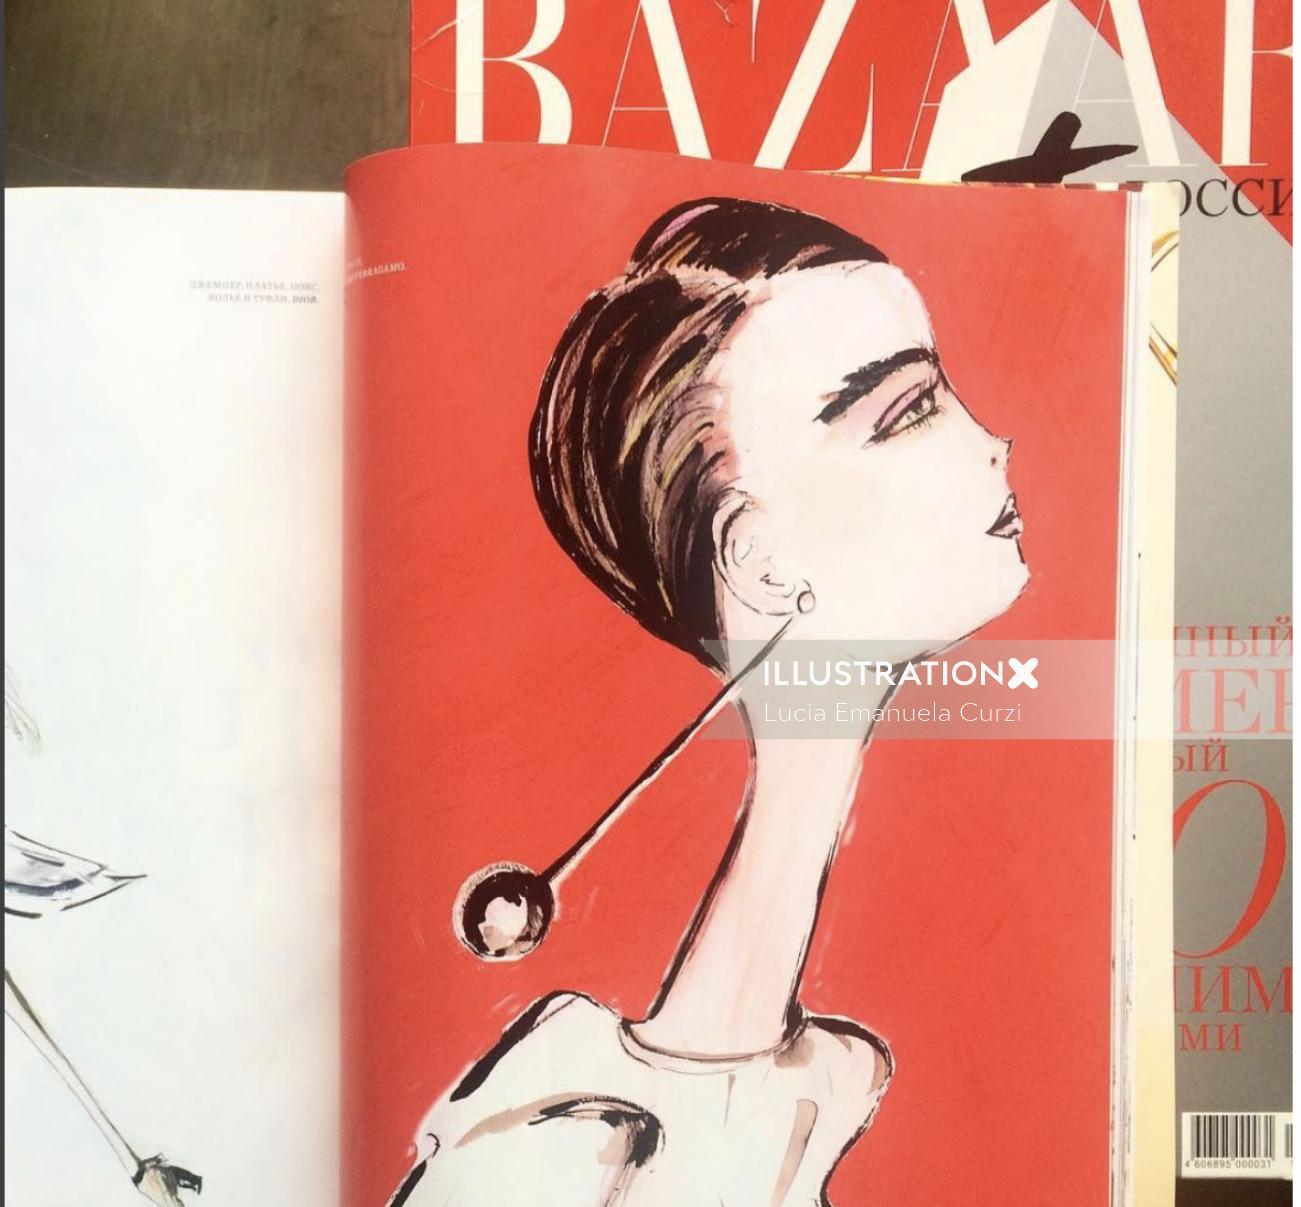 Fashion Bazaar magazine cover